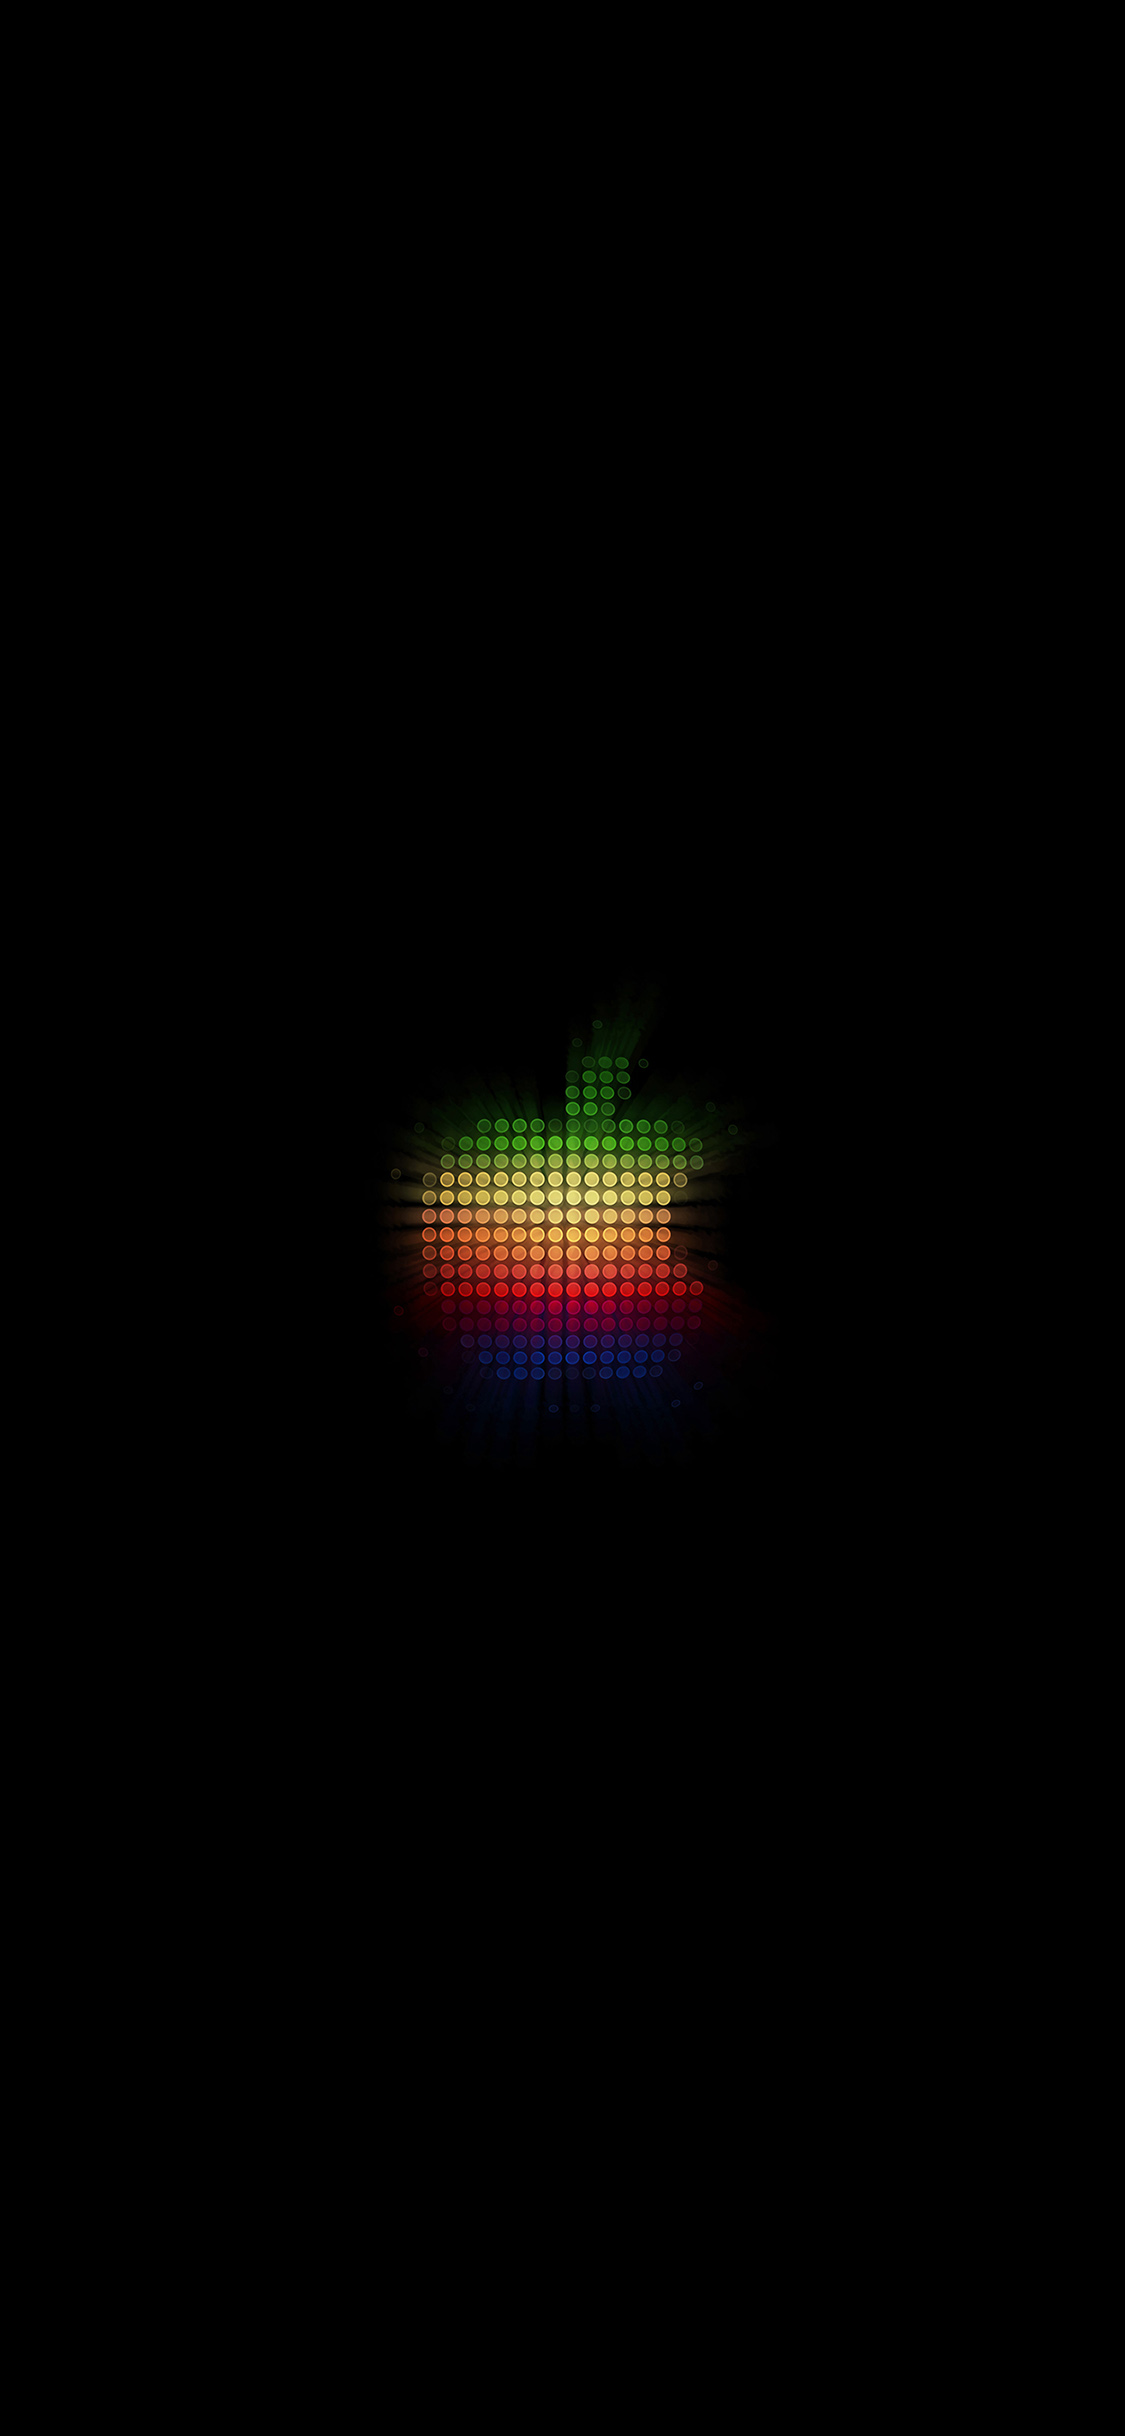 Iphonexpapers Com Iphone X Wallpaper At40 Logo Apple Rainbow Pixel Art Illustration